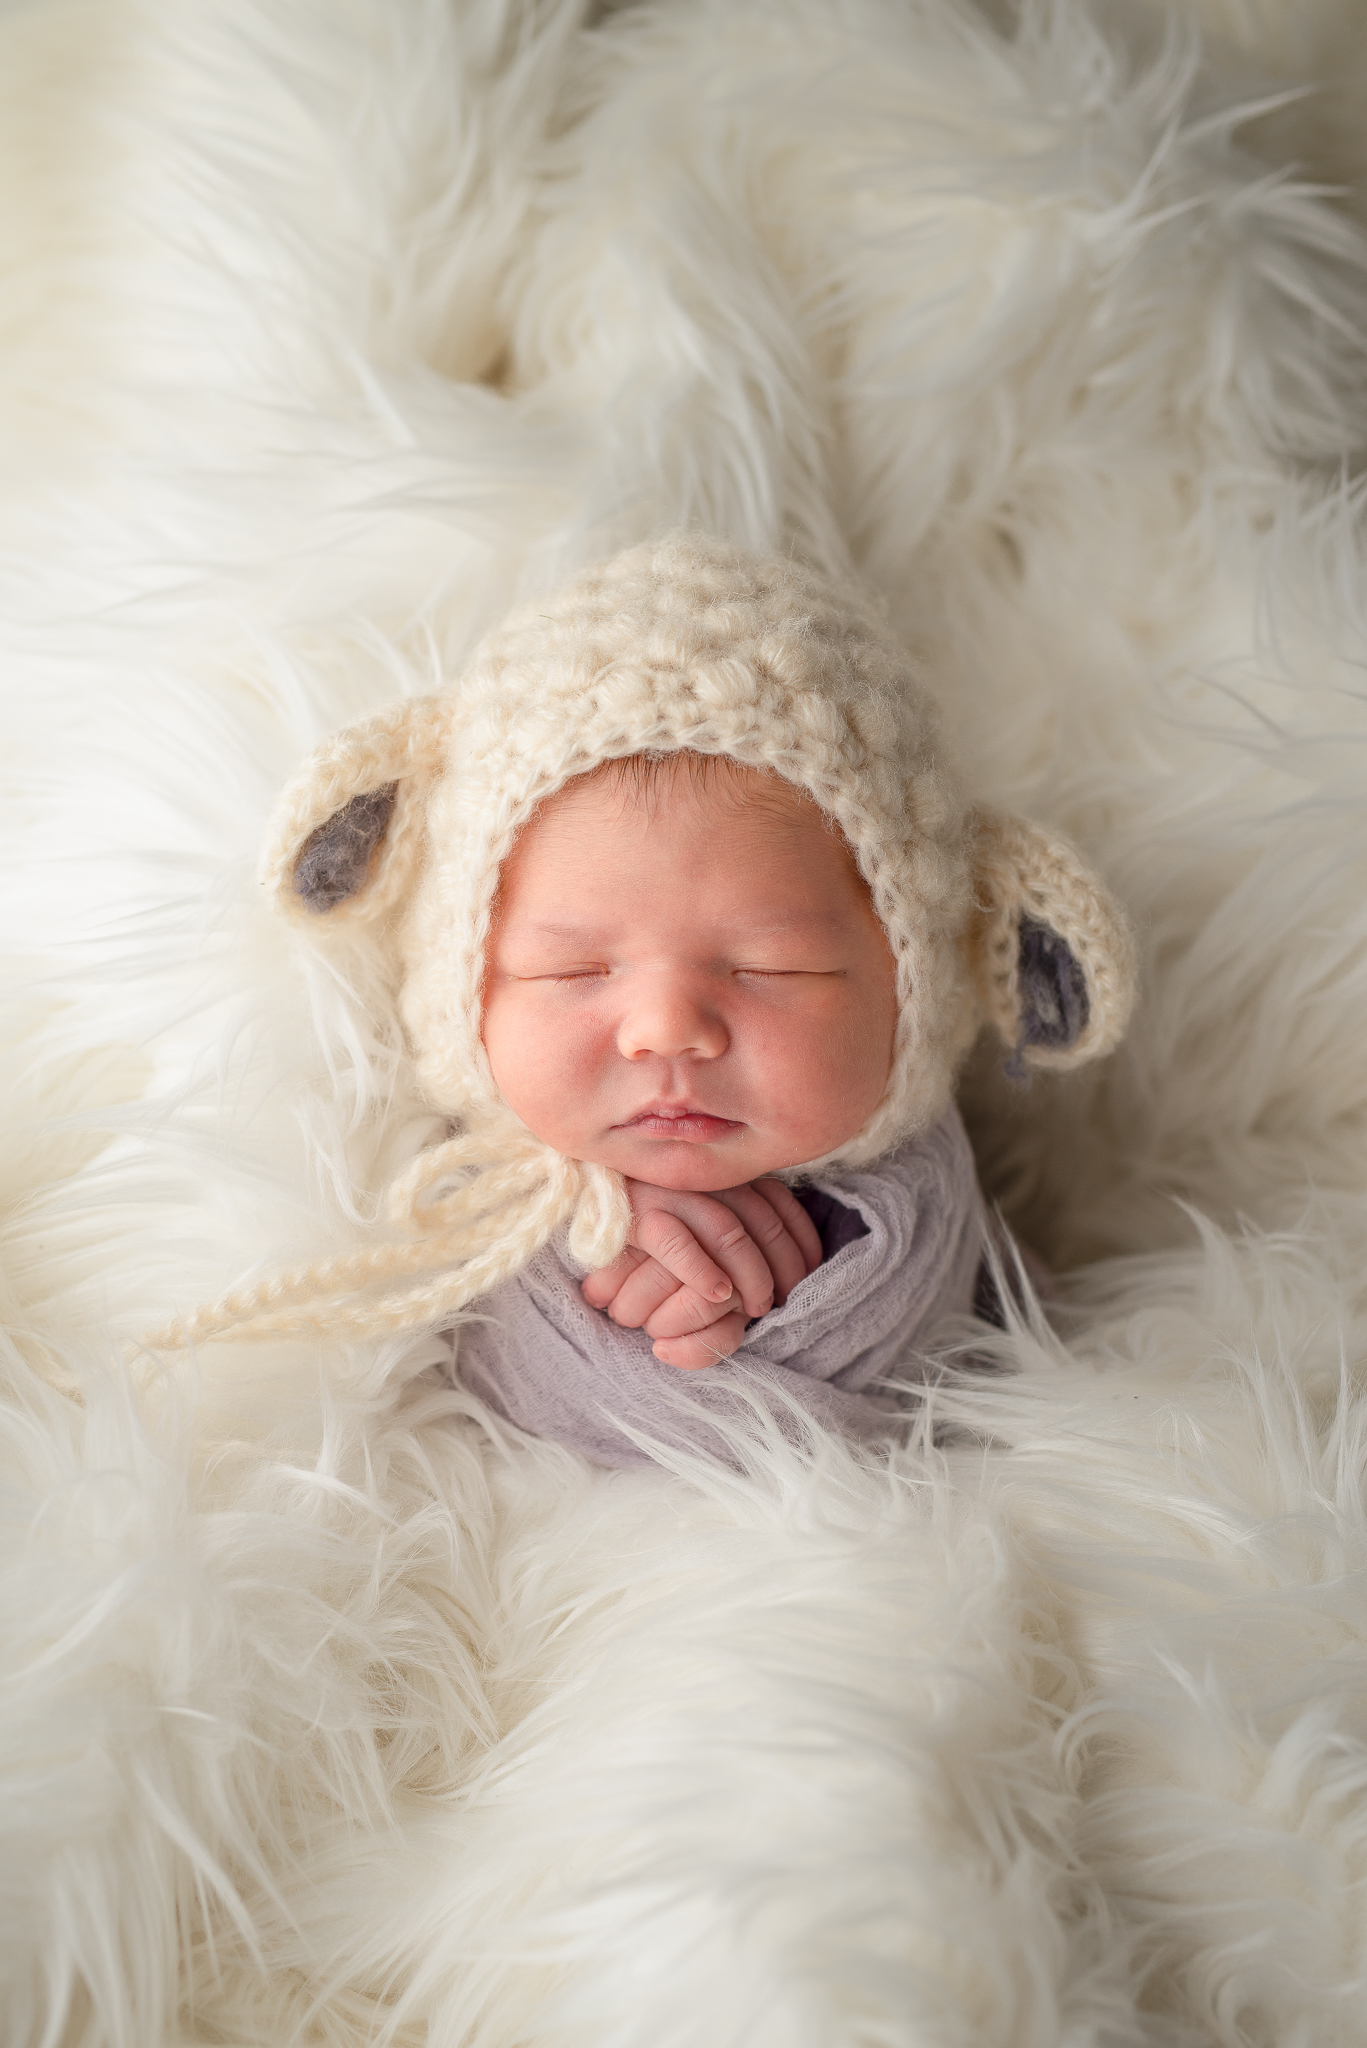 Newborn30NaomiLuciennePhotography102018-5-Edit.jpg